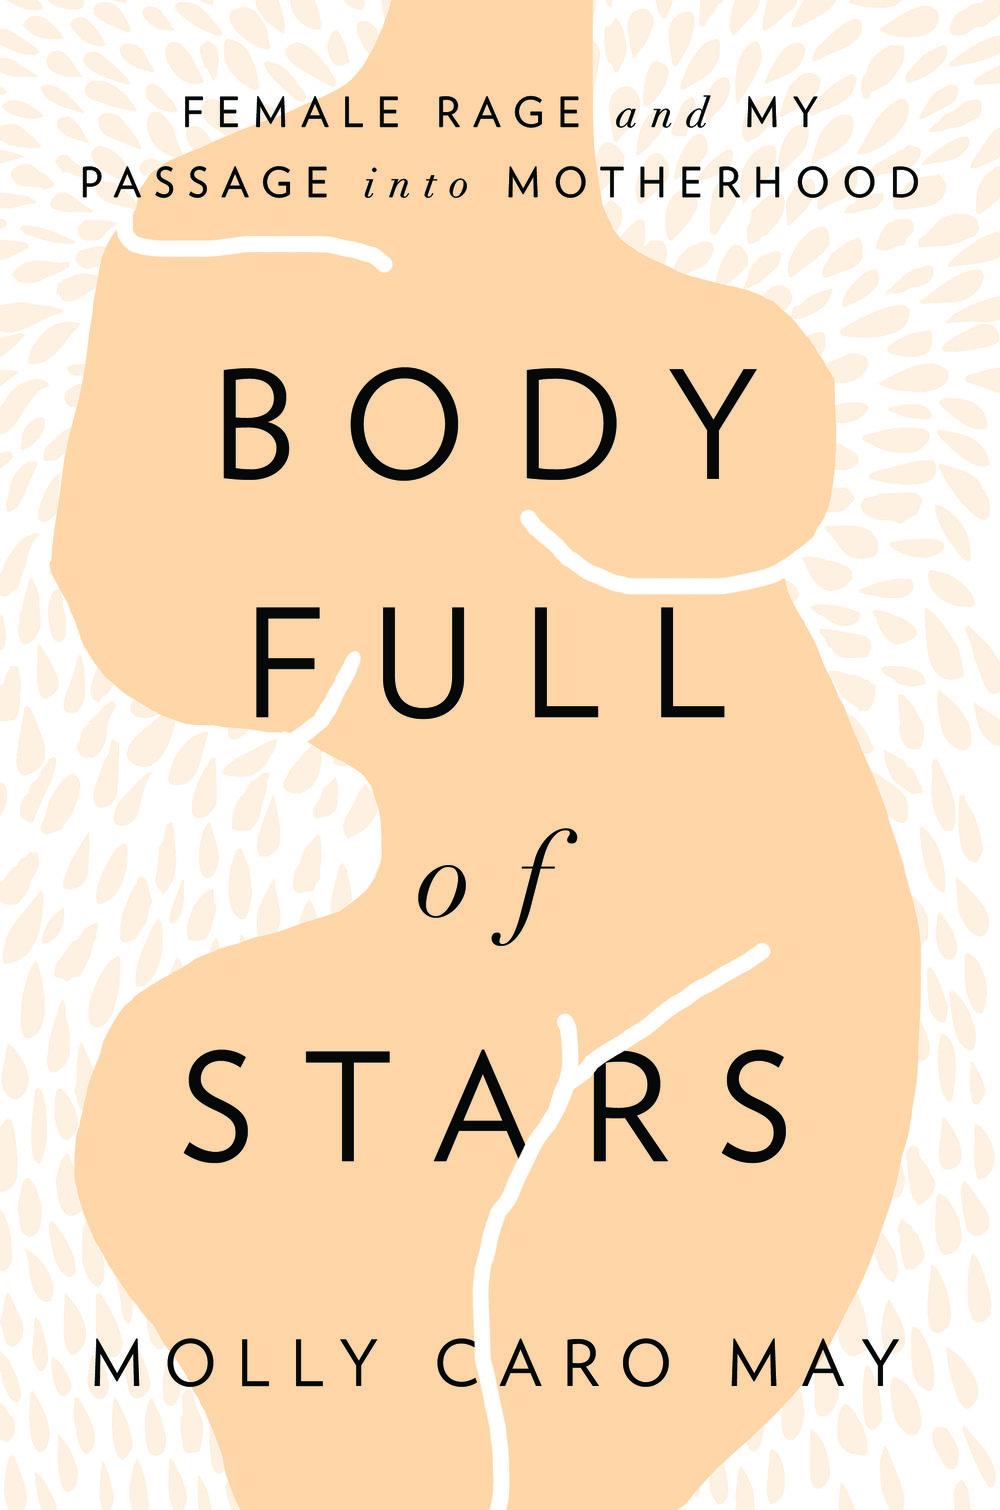 Body Full of Stars -          0 false   18 pt 18 pt 0 0  false false false                       /* Style Definitions */ table.MsoNormalTable {mso-style-name: